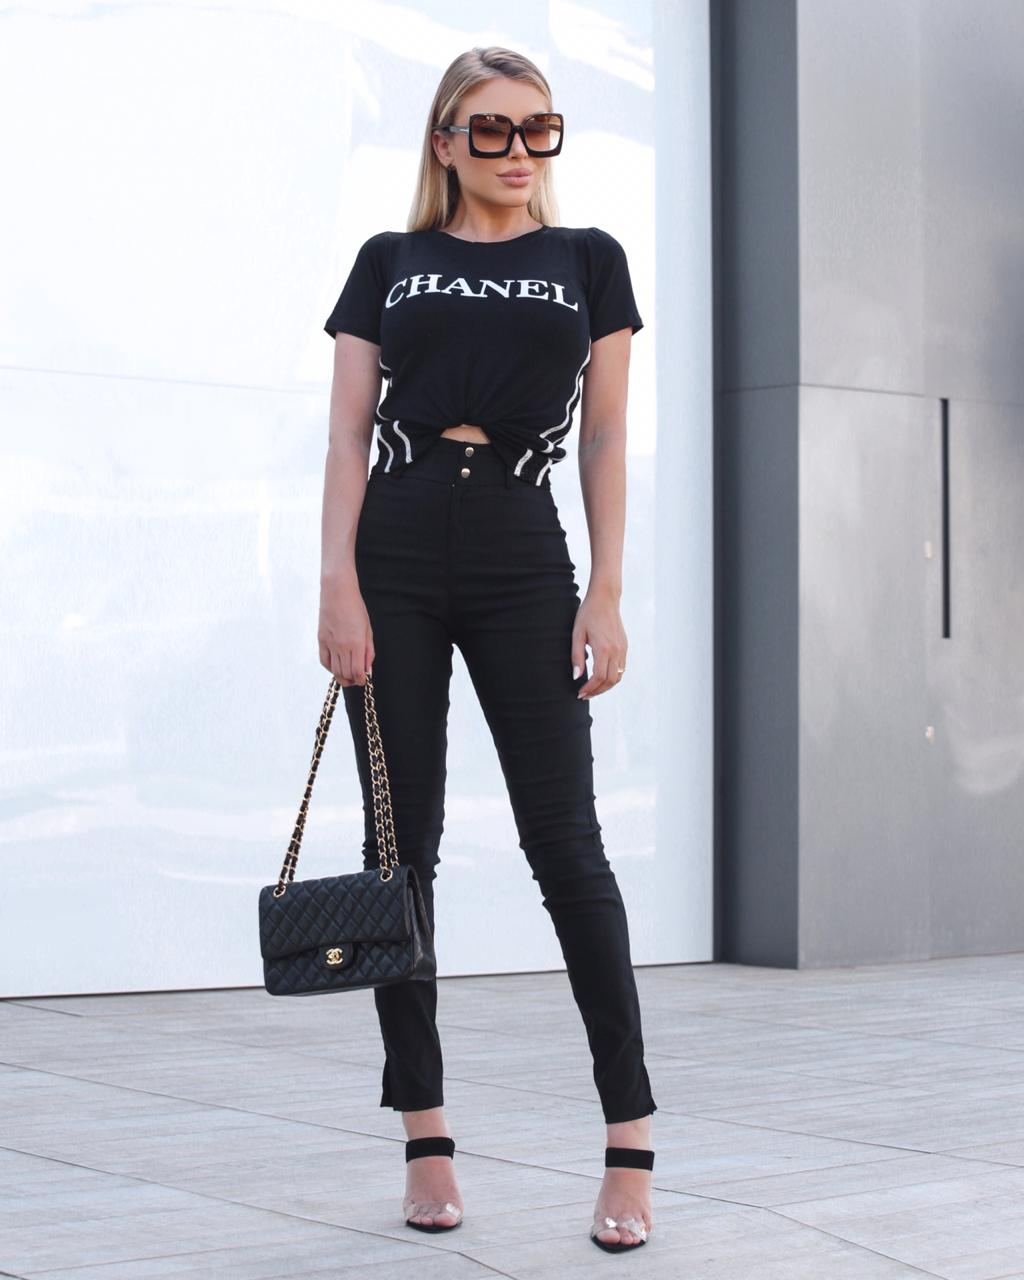 T-Shirt Chanel De Malha Com Guippir